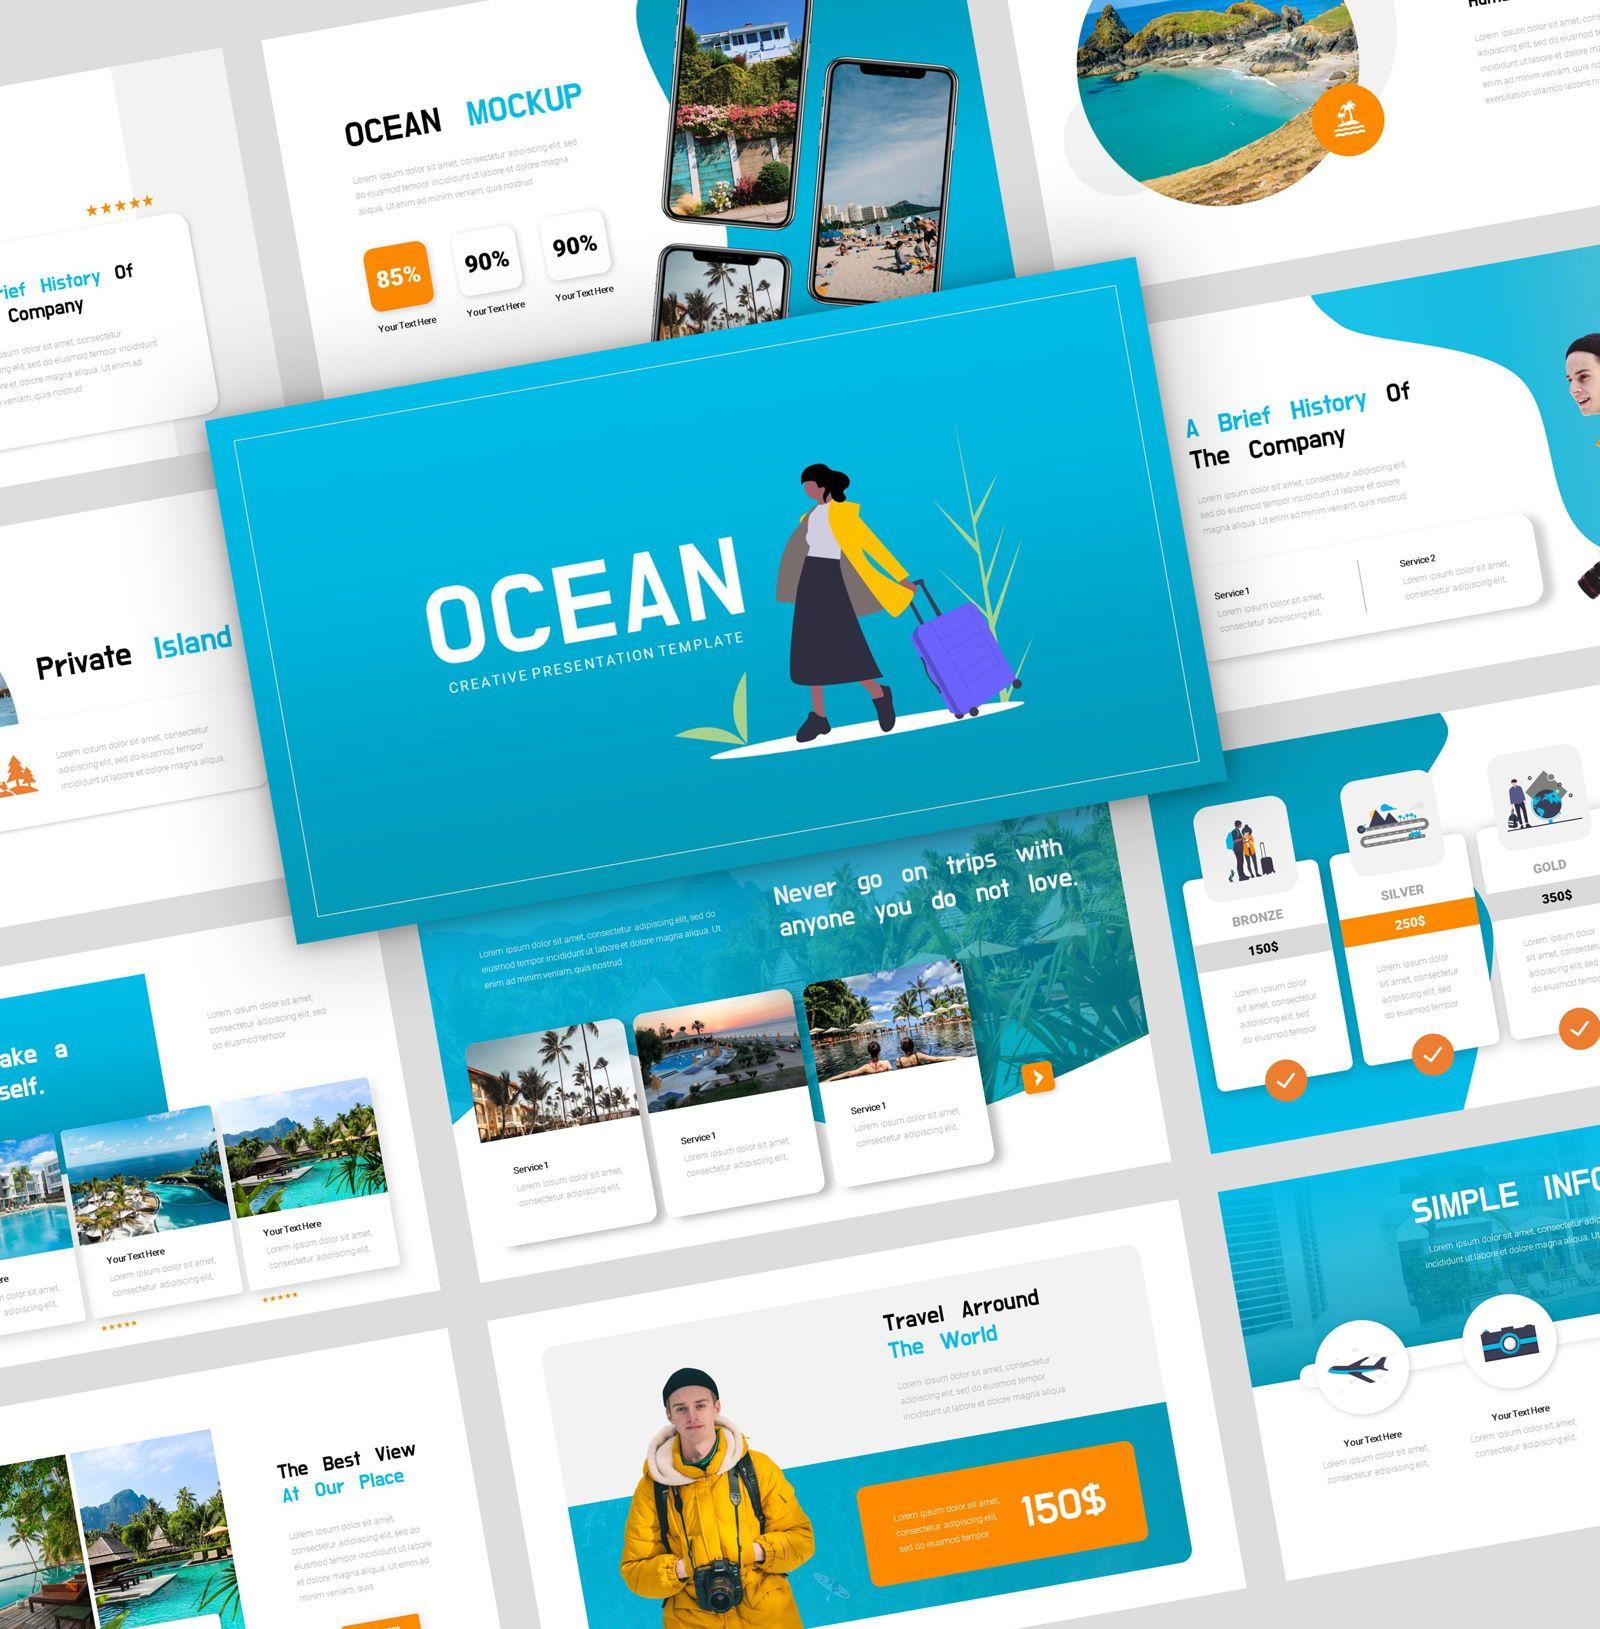 Ocean - PowerPoint Presentation Template, 08166, Presentation Templates — PoweredTemplate.com